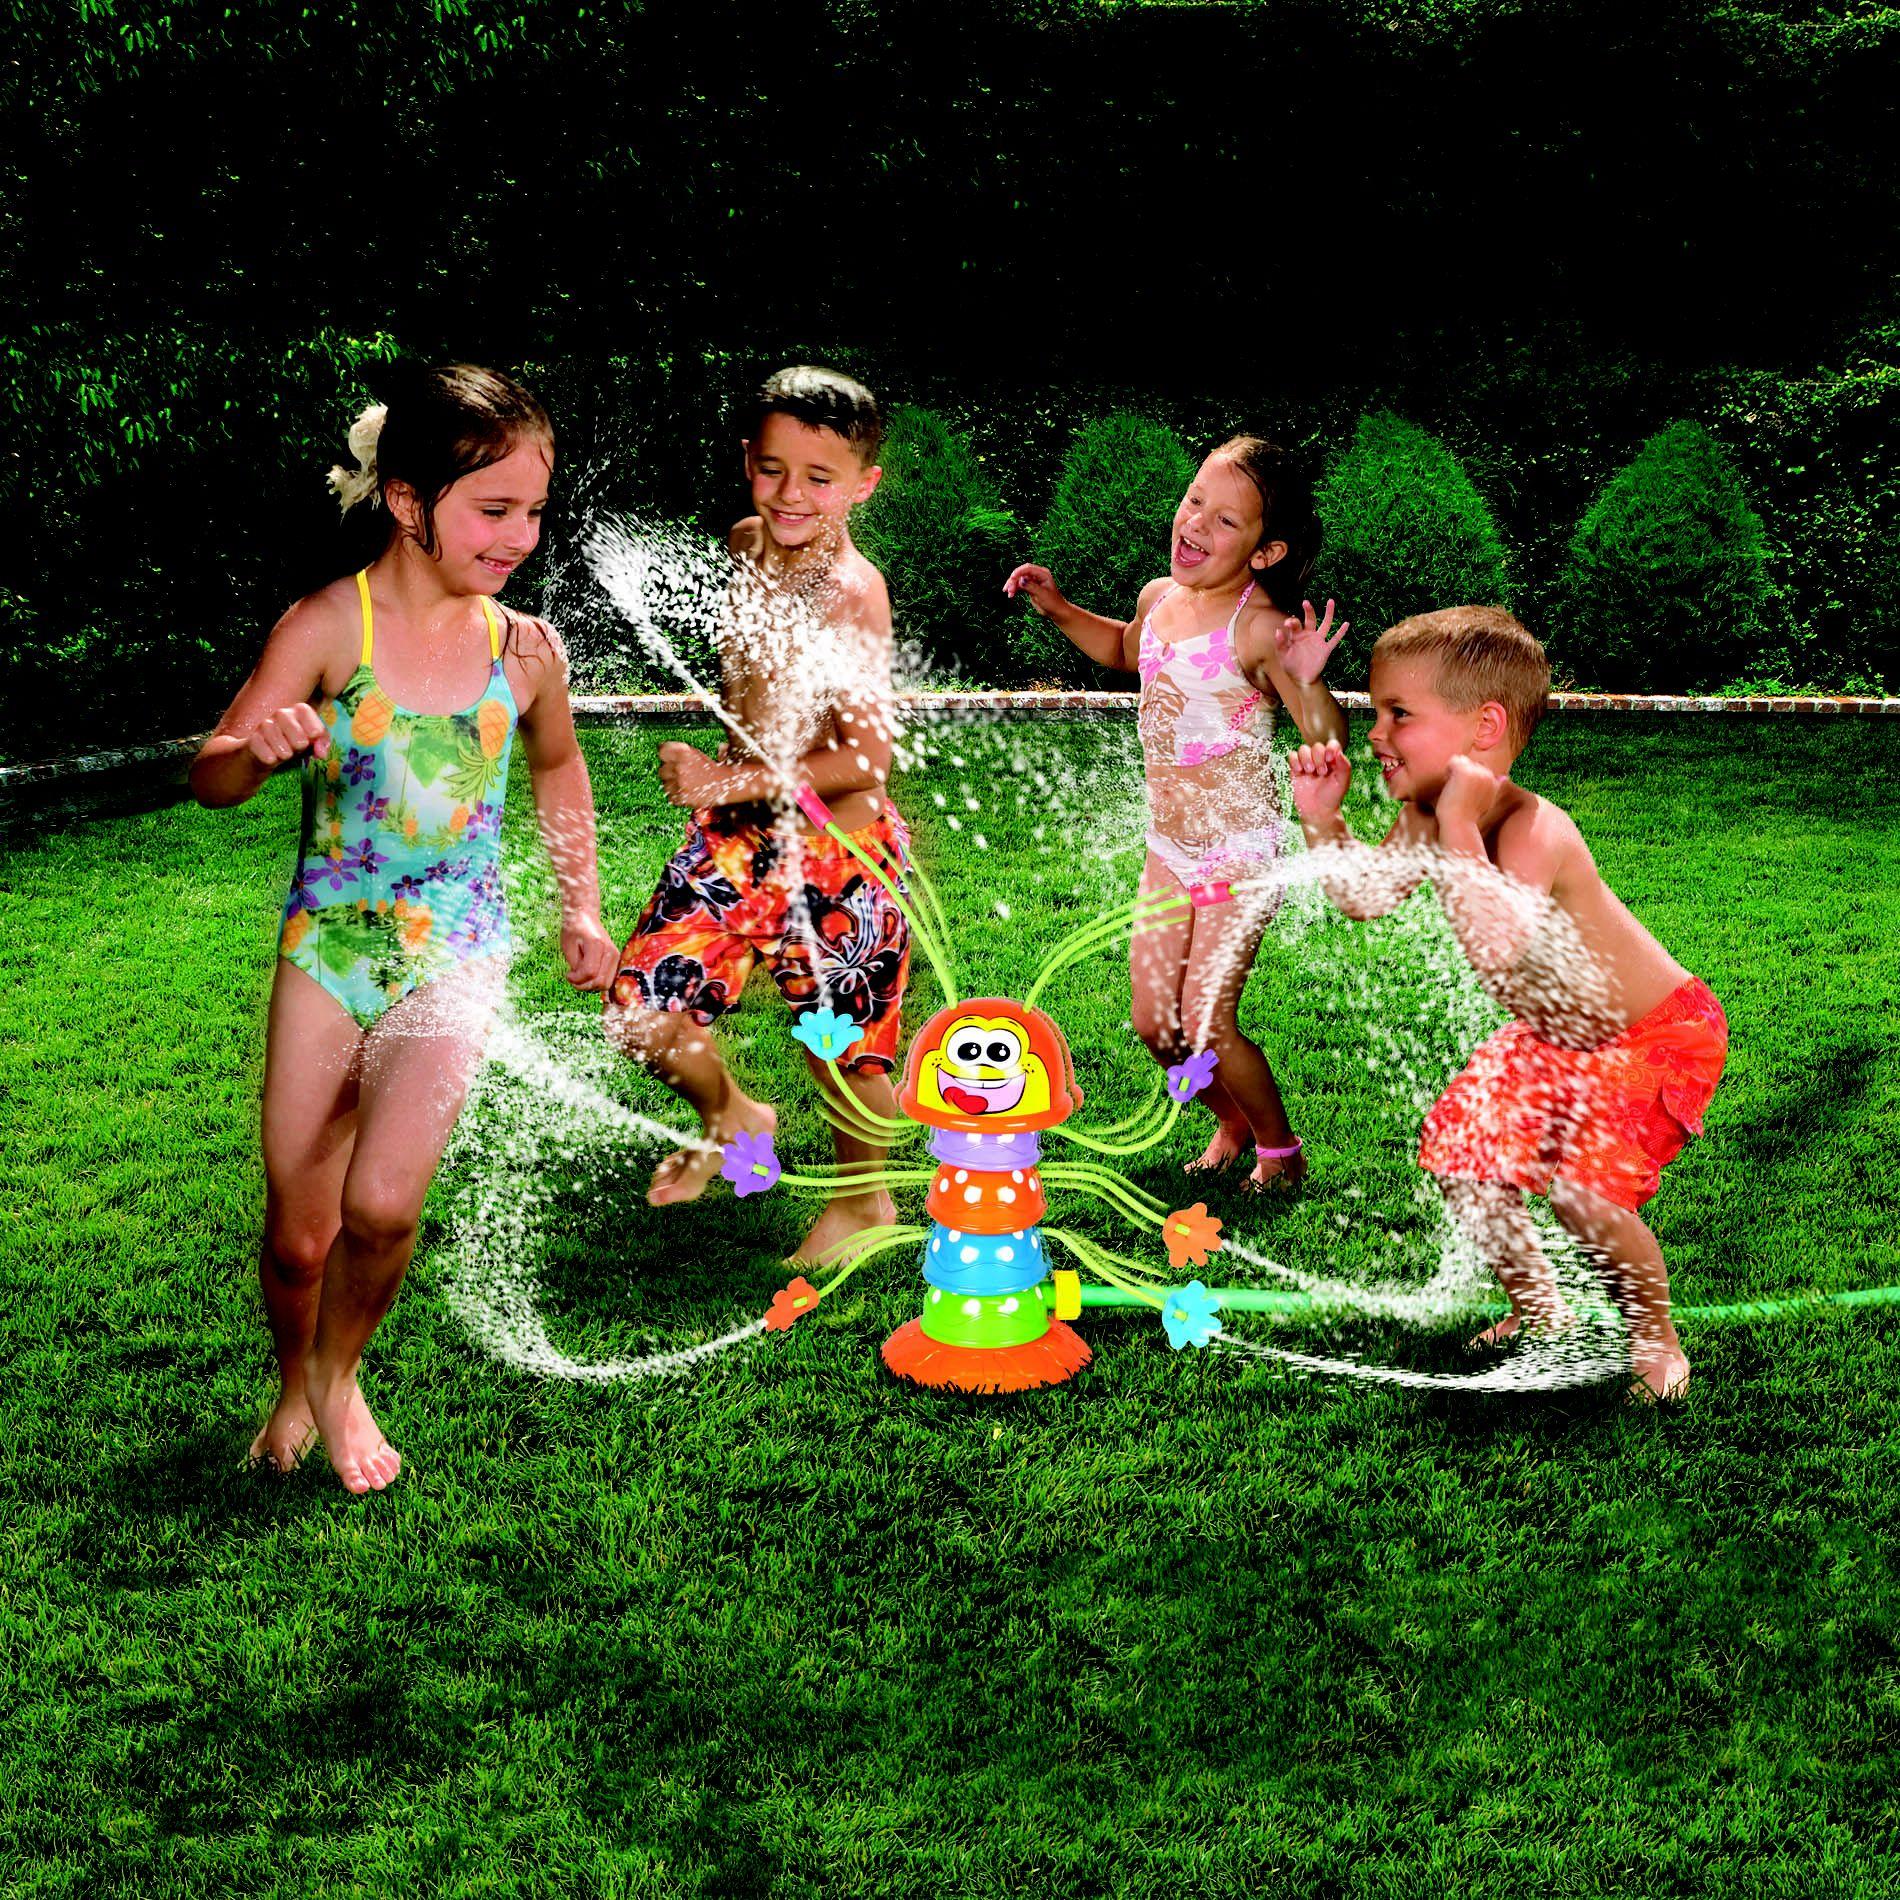 Manley Toys u.s.a., Ltd Banzai Wiggling Waterpillar Sprinkler - MANLEY TOYS USA LTD.